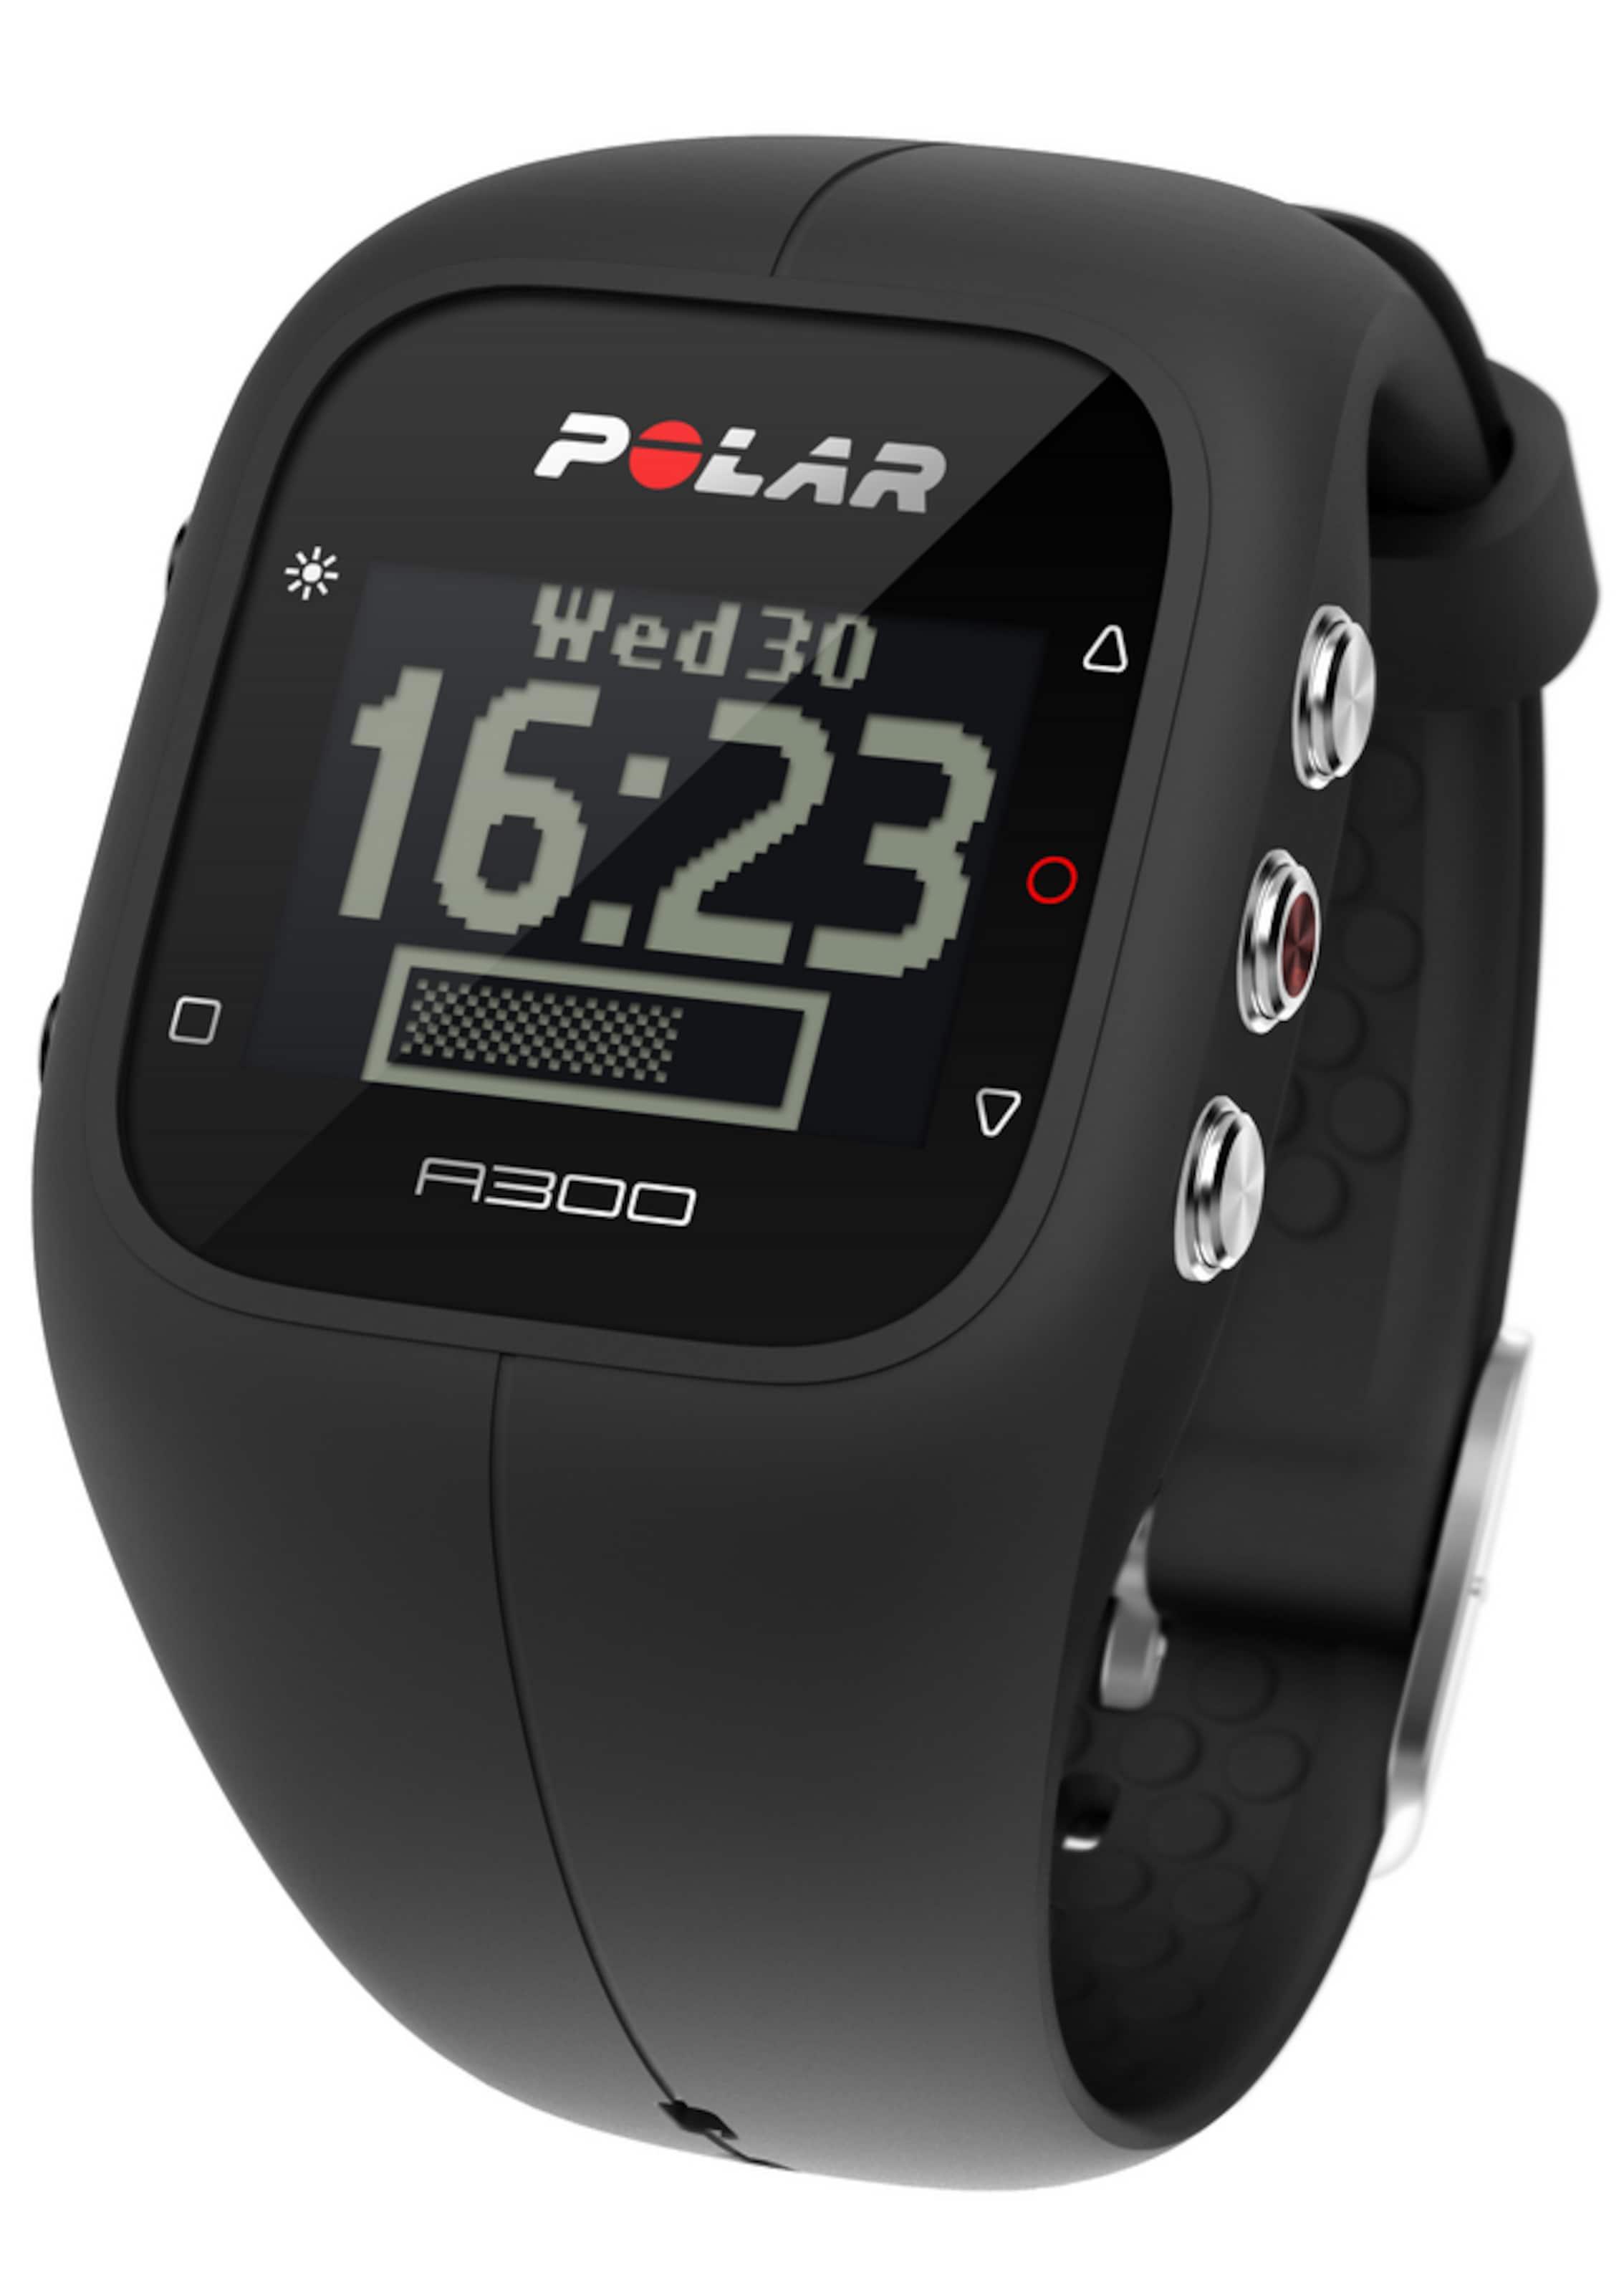 Freies Verschiffen Shop POLAR Fitness Activity Tracker 'A300 Charcoal Black HR' inkl. Brustgurt Steckdose Reihenfolge Rabatt Eastbay q93yb6MKn